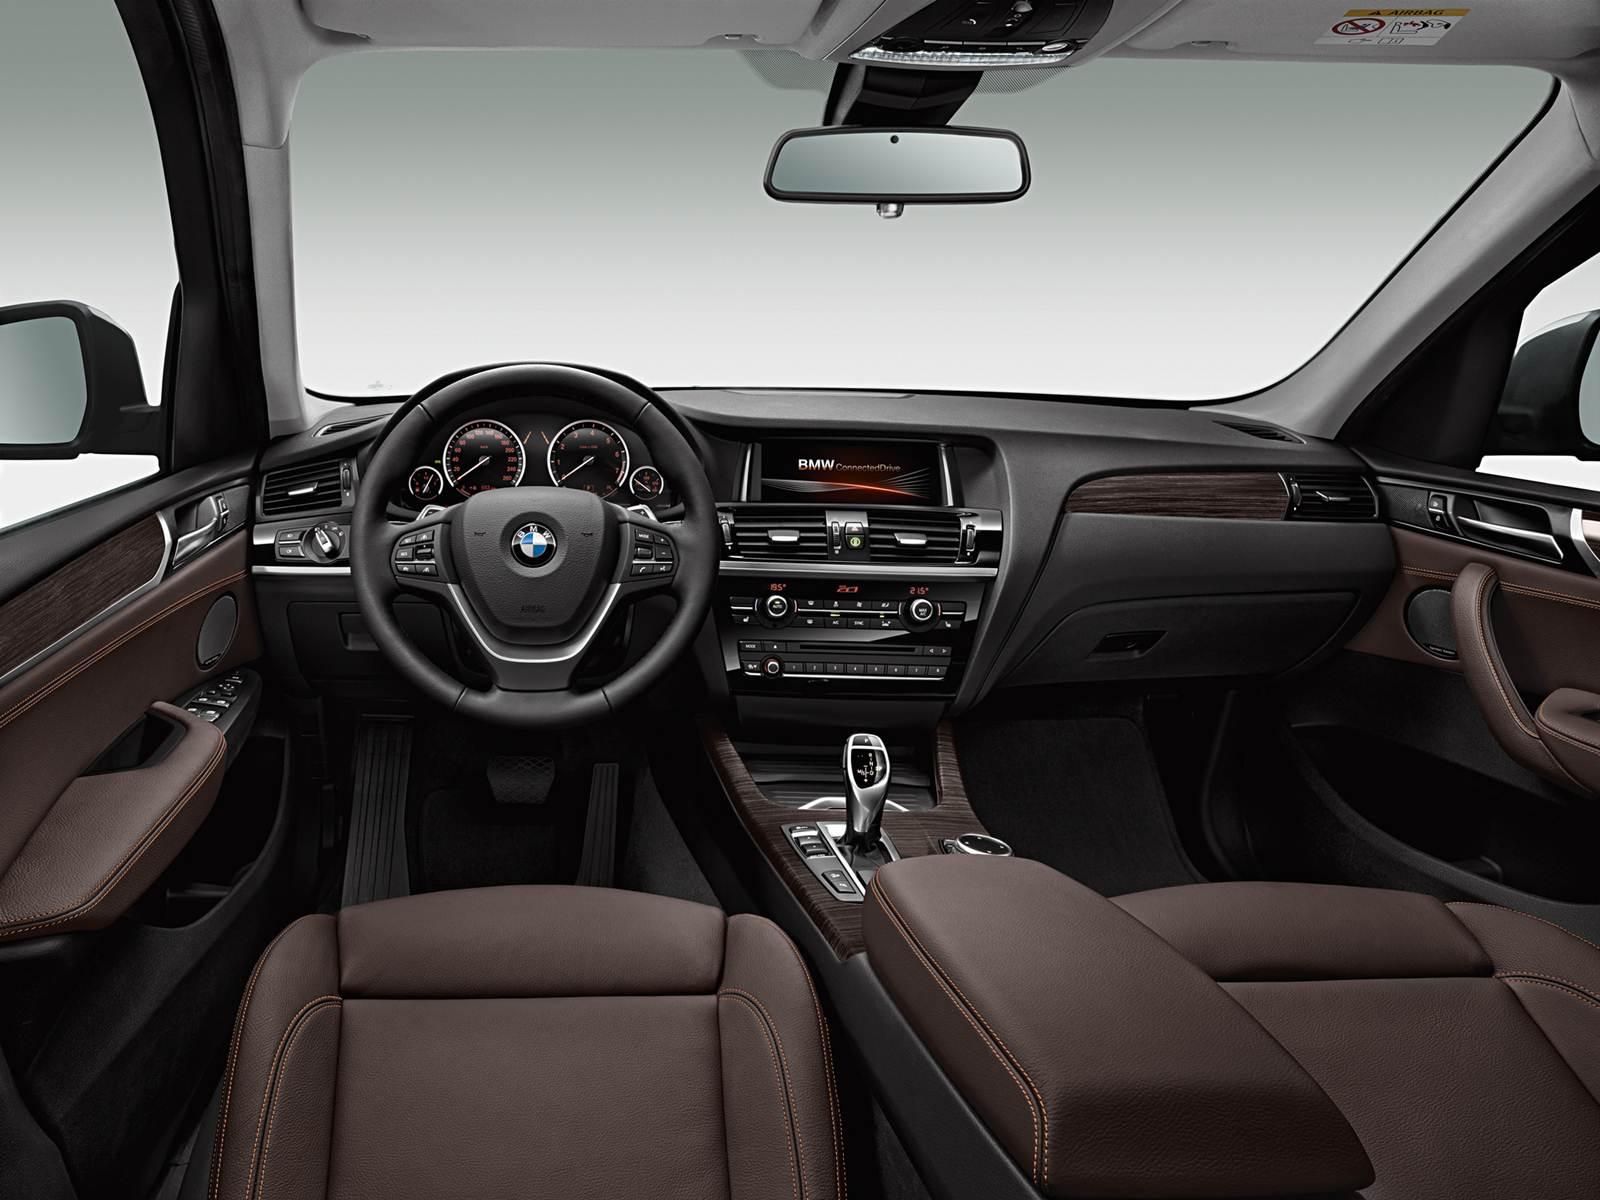 Novo BMW X3 ISOFIX Recall